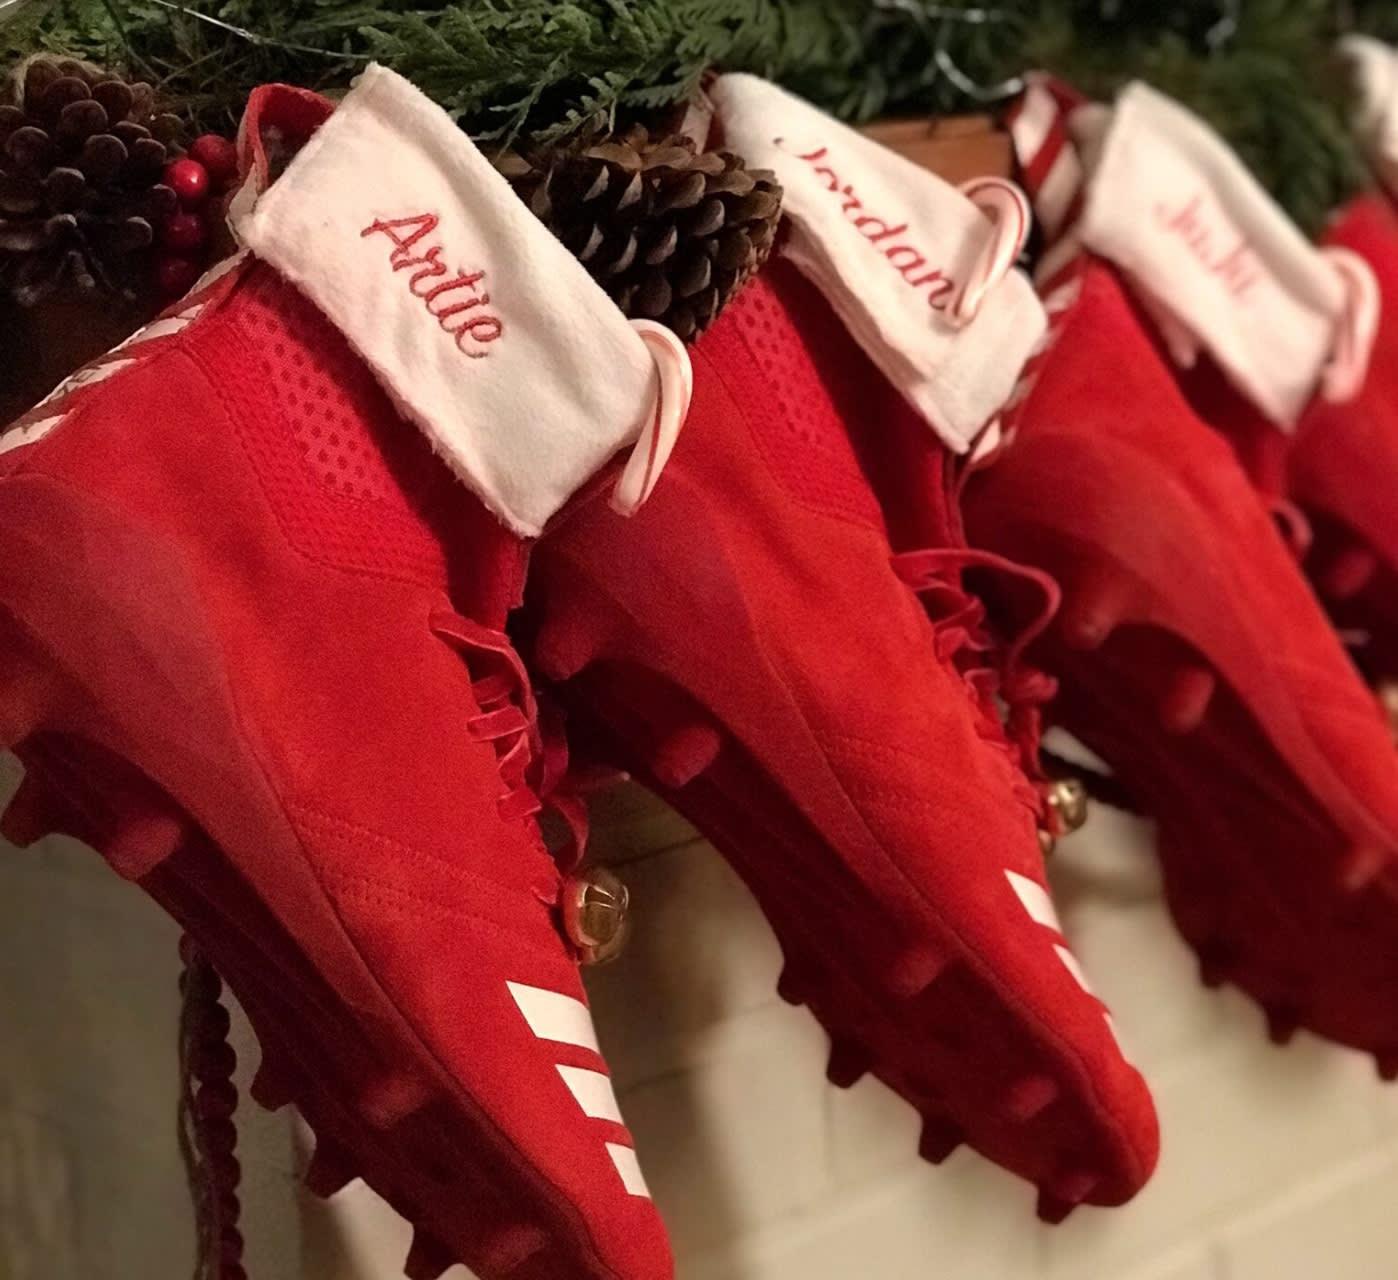 Adidas Football Christmas Stocking Cleats (4)